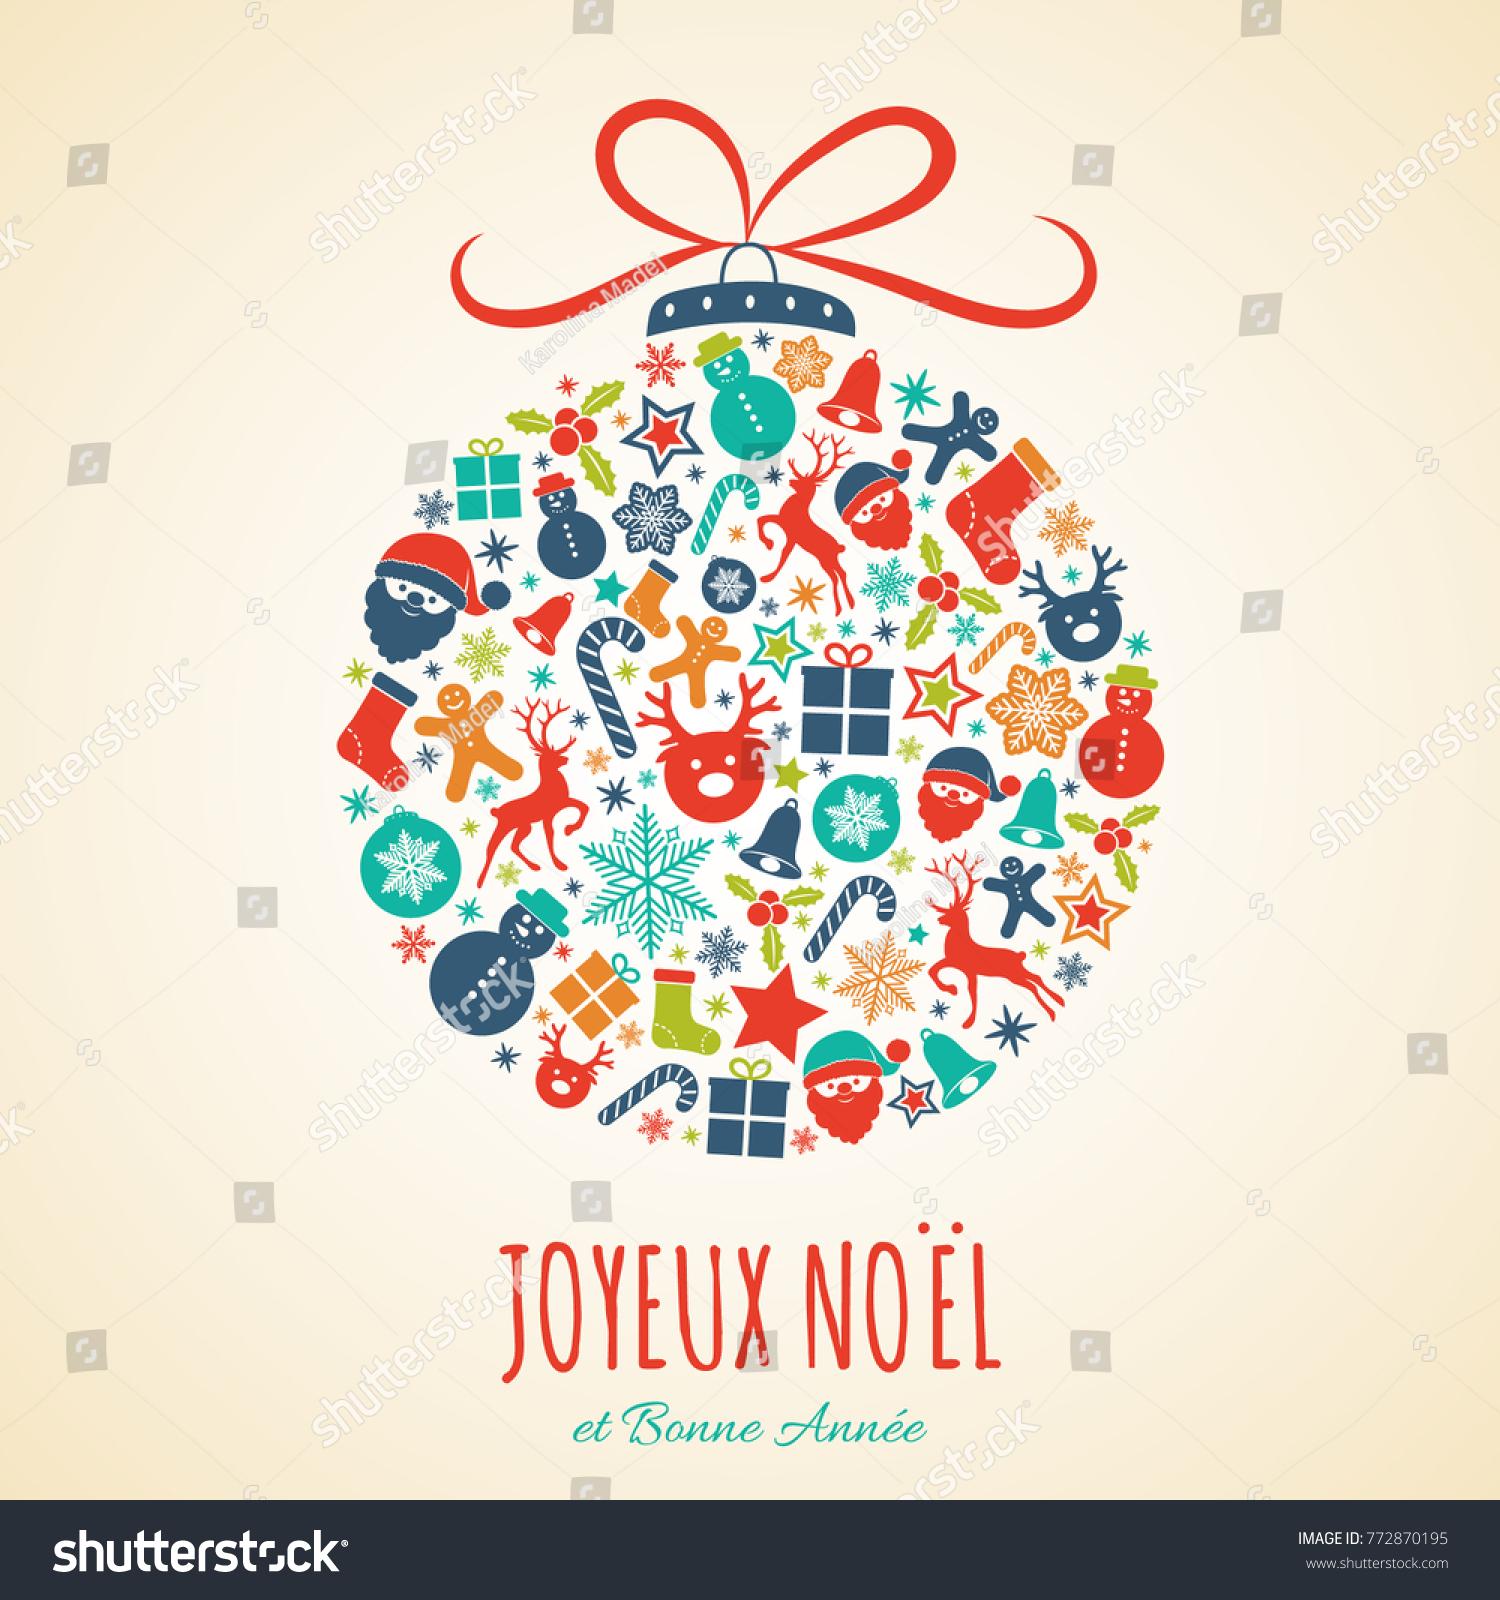 Joyeux Noel Merry Christmas French Christmas Stock Vector (Royalty ...